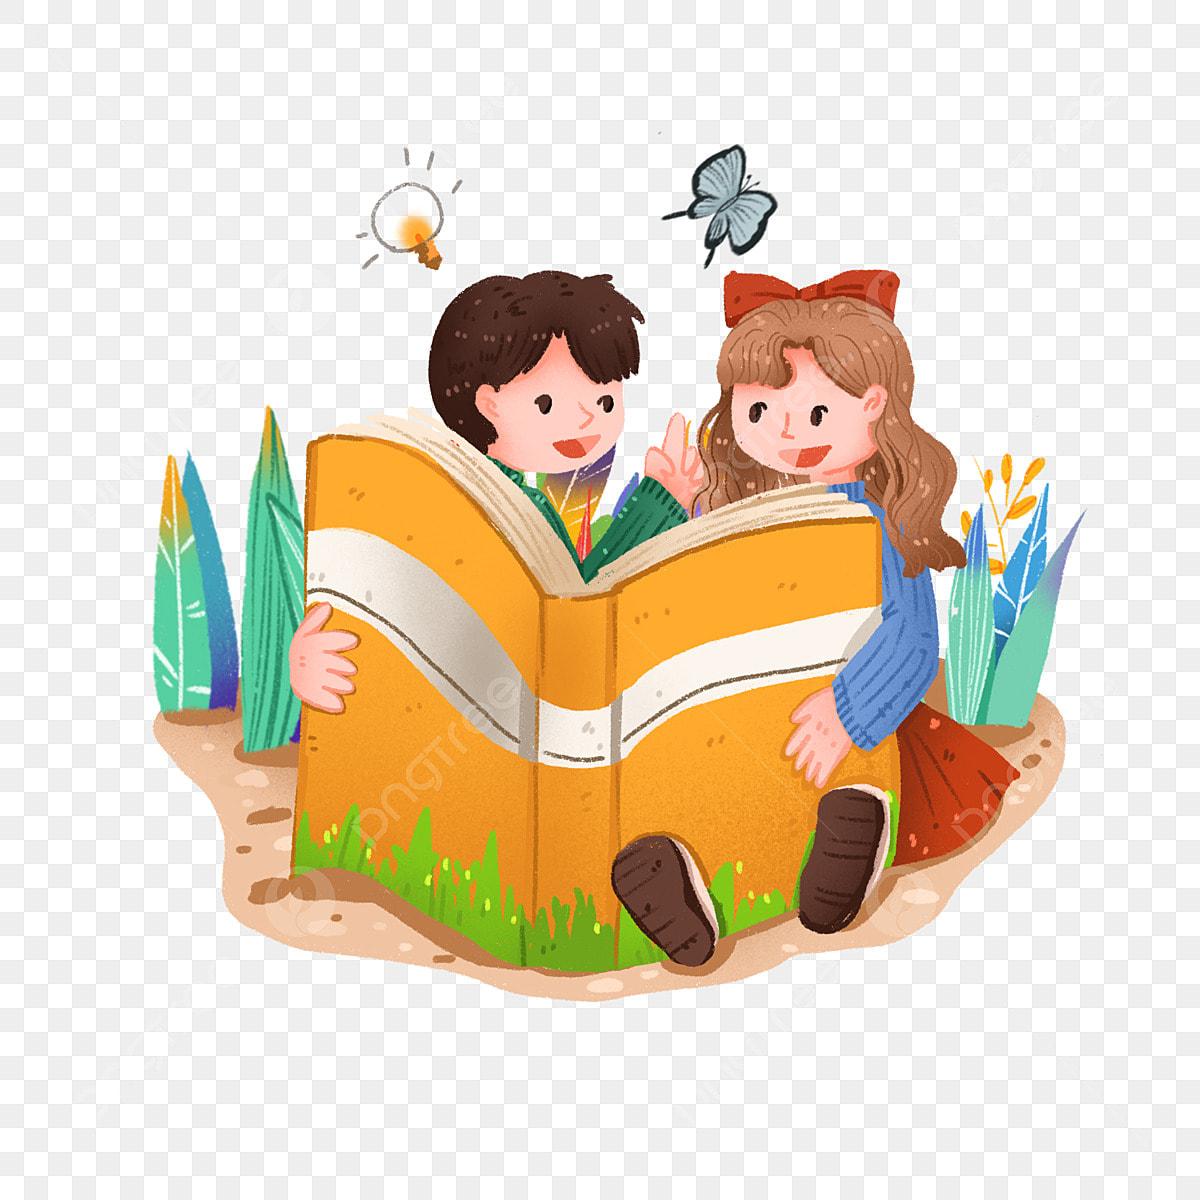 Free Children Reading Books Clipart, Download Free Clip Art, Free Clip Art  on Clipart Library